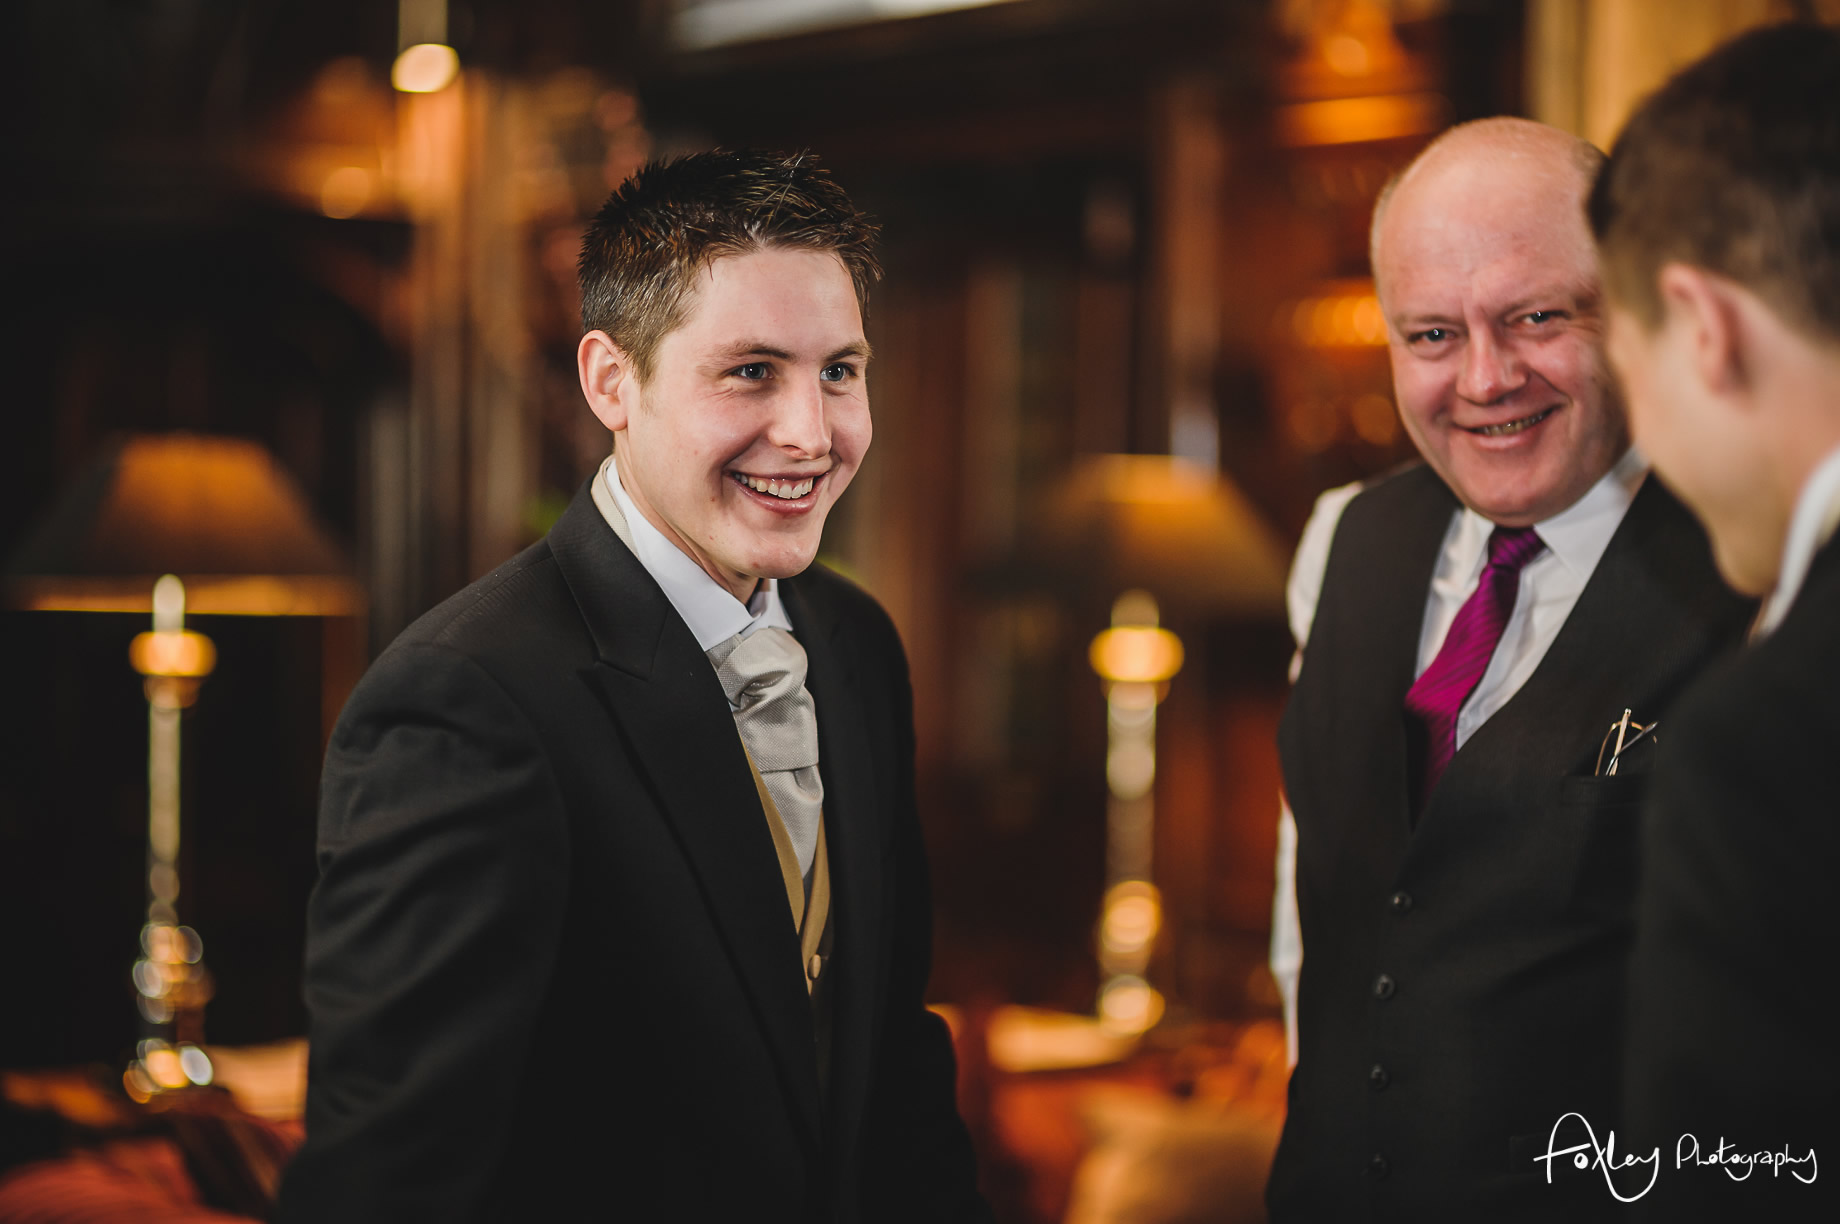 Gemma and Lewis' Wedding at Mitton Hall 059